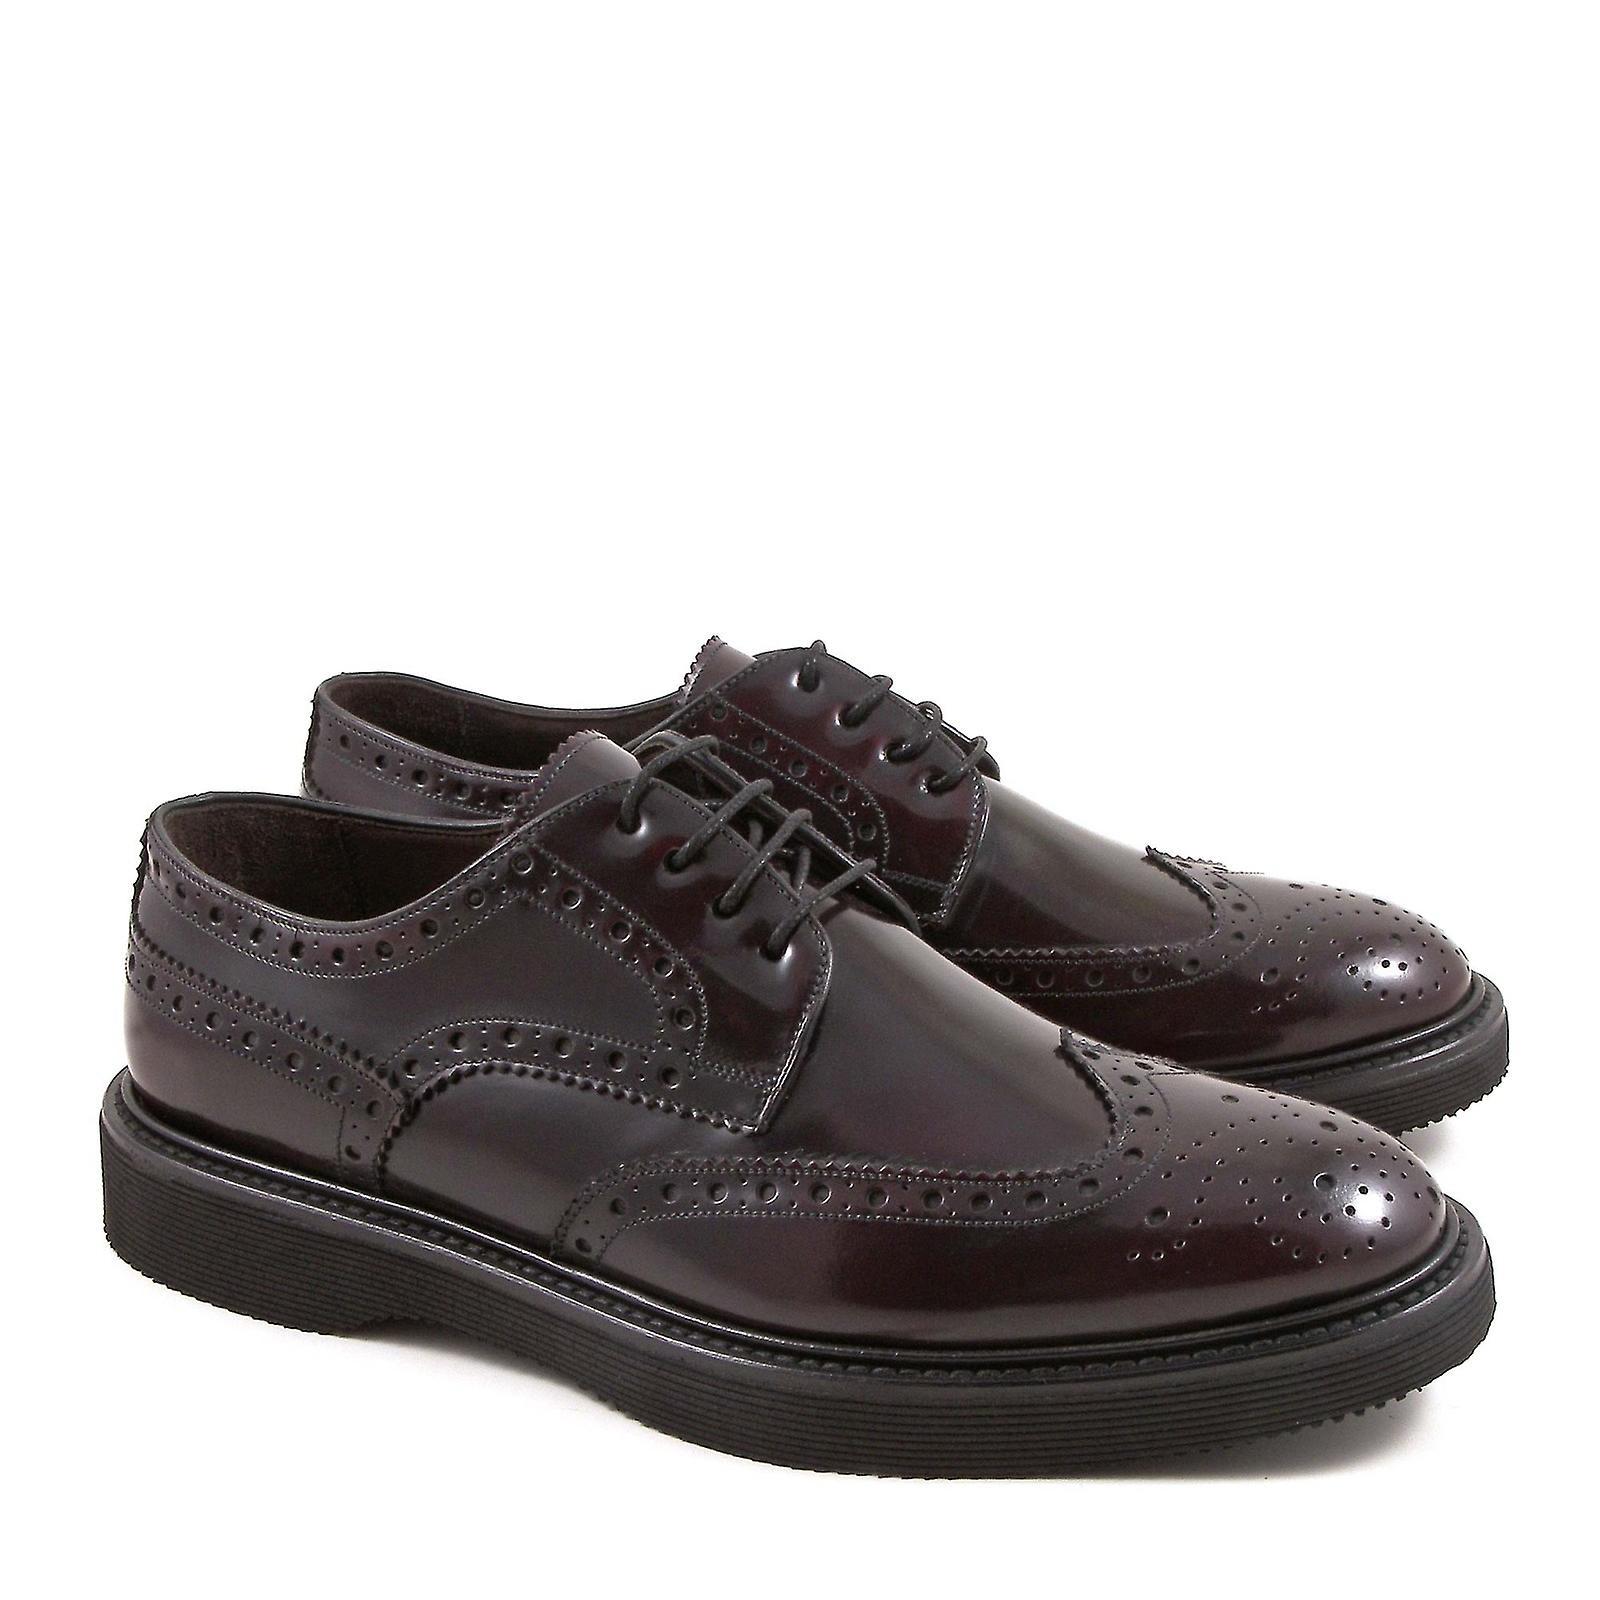 Handmade wingtip men's burgundy lux leather wingtip Handmade shoes f86097